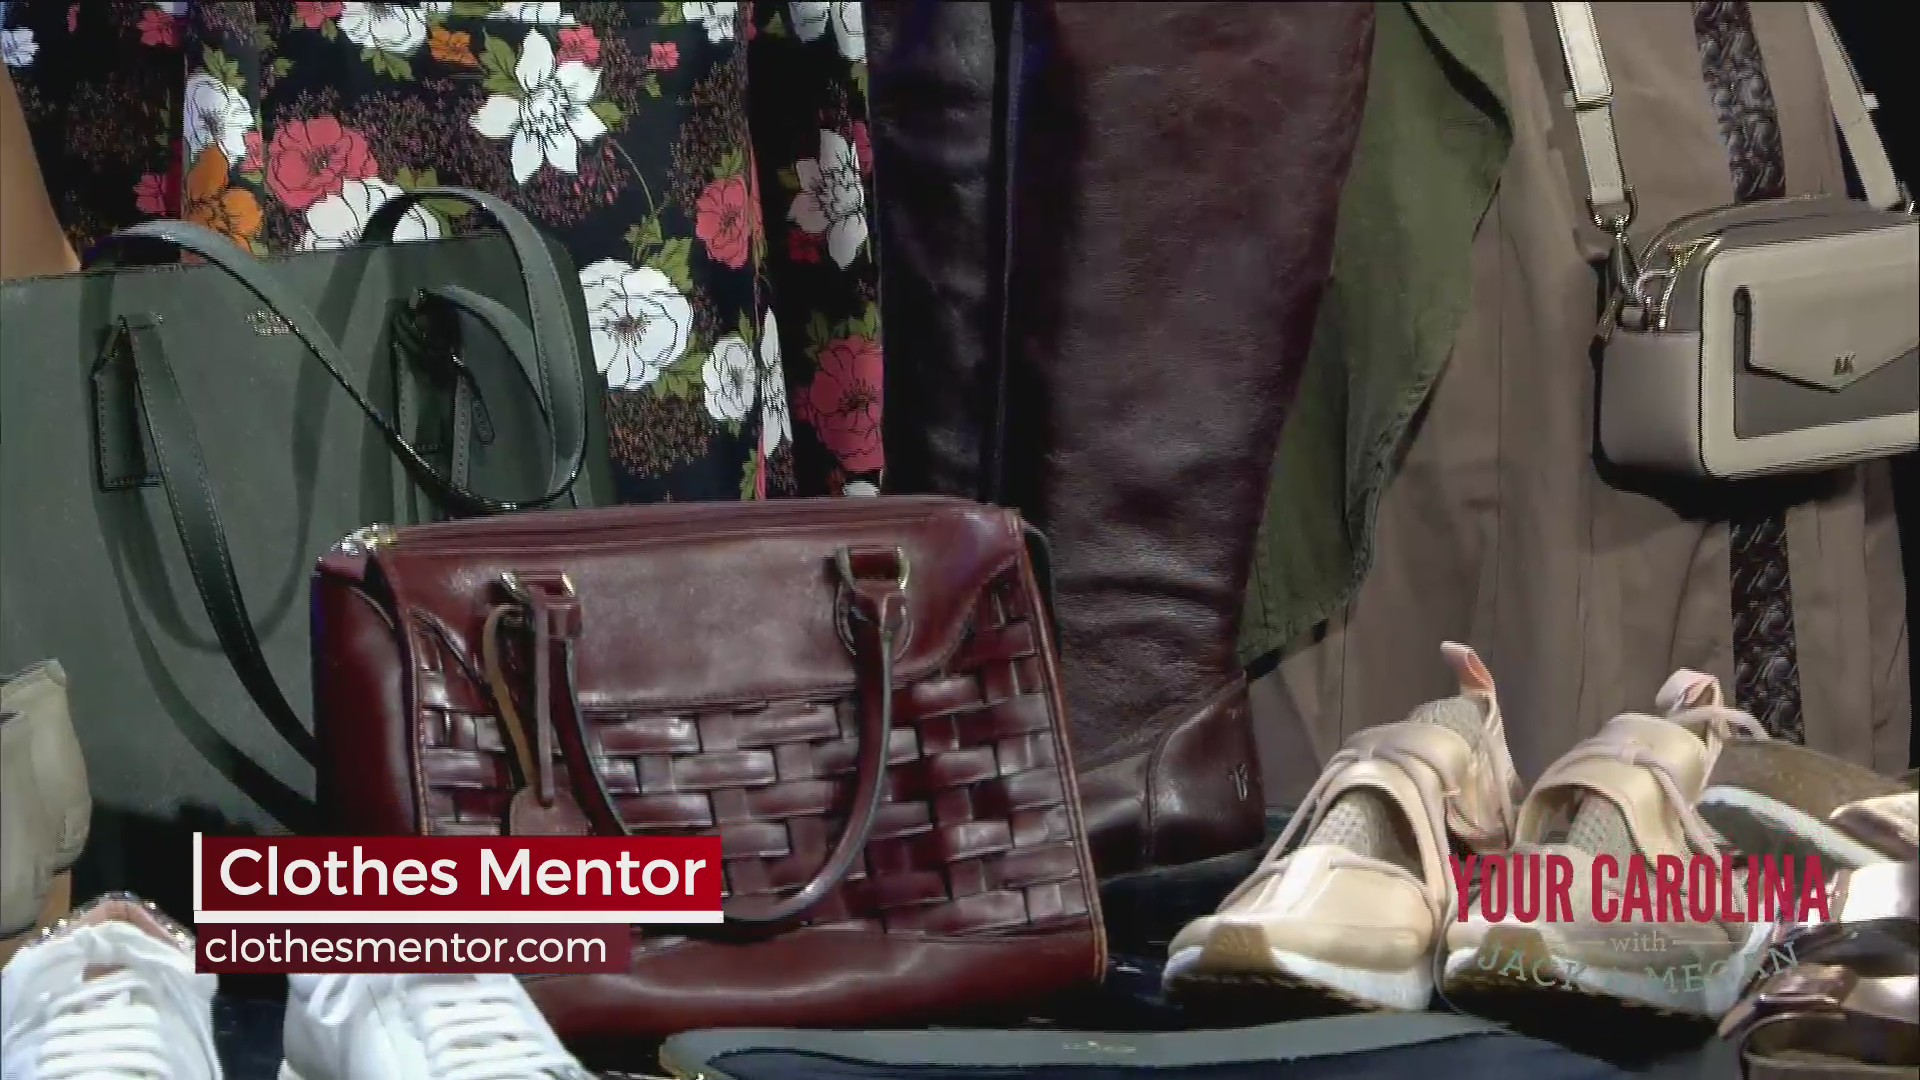 Fashion Trend Tuesday - Transitioning To Fall Fashions